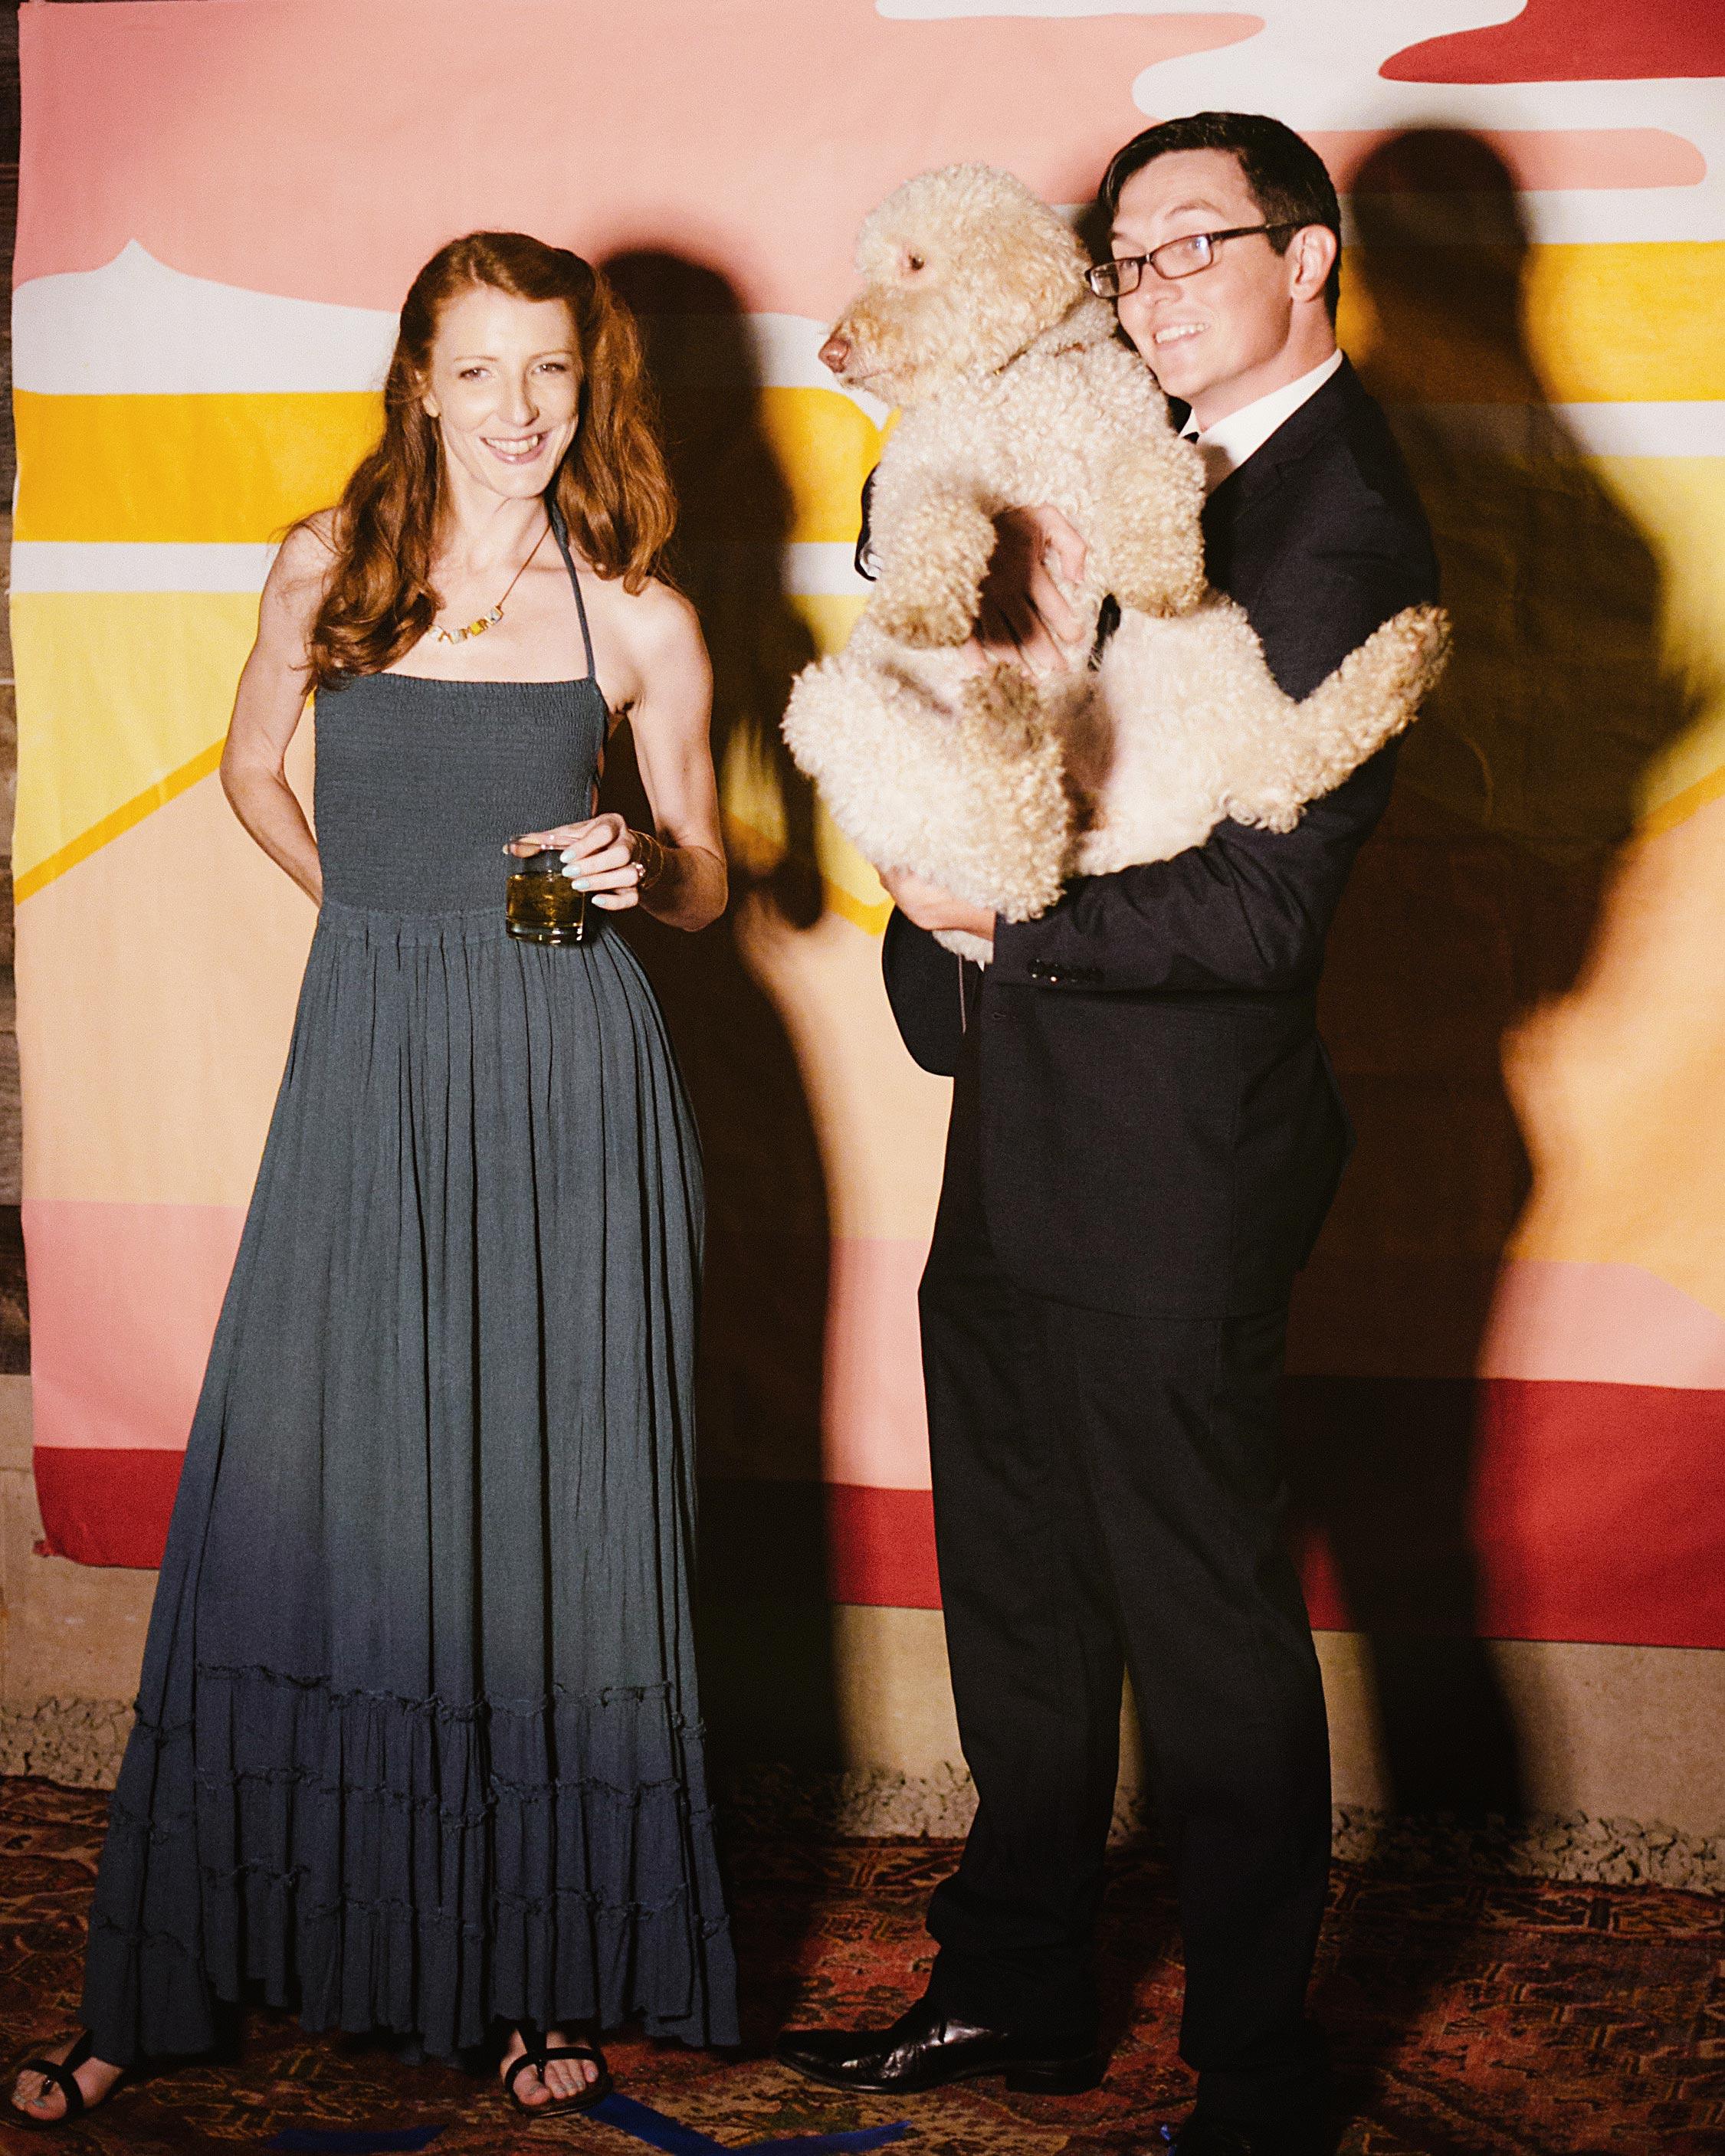 cat-vince-wedding-photobooth-050-s112646-0216.jpg